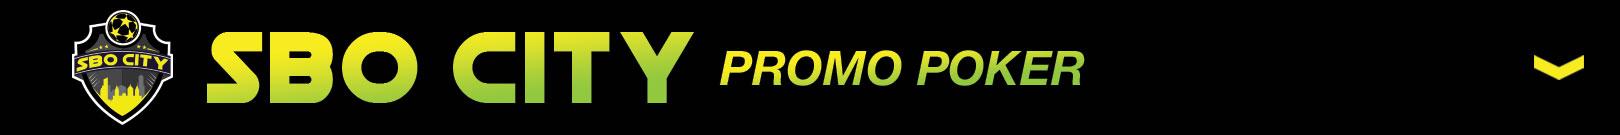 Promo Poker